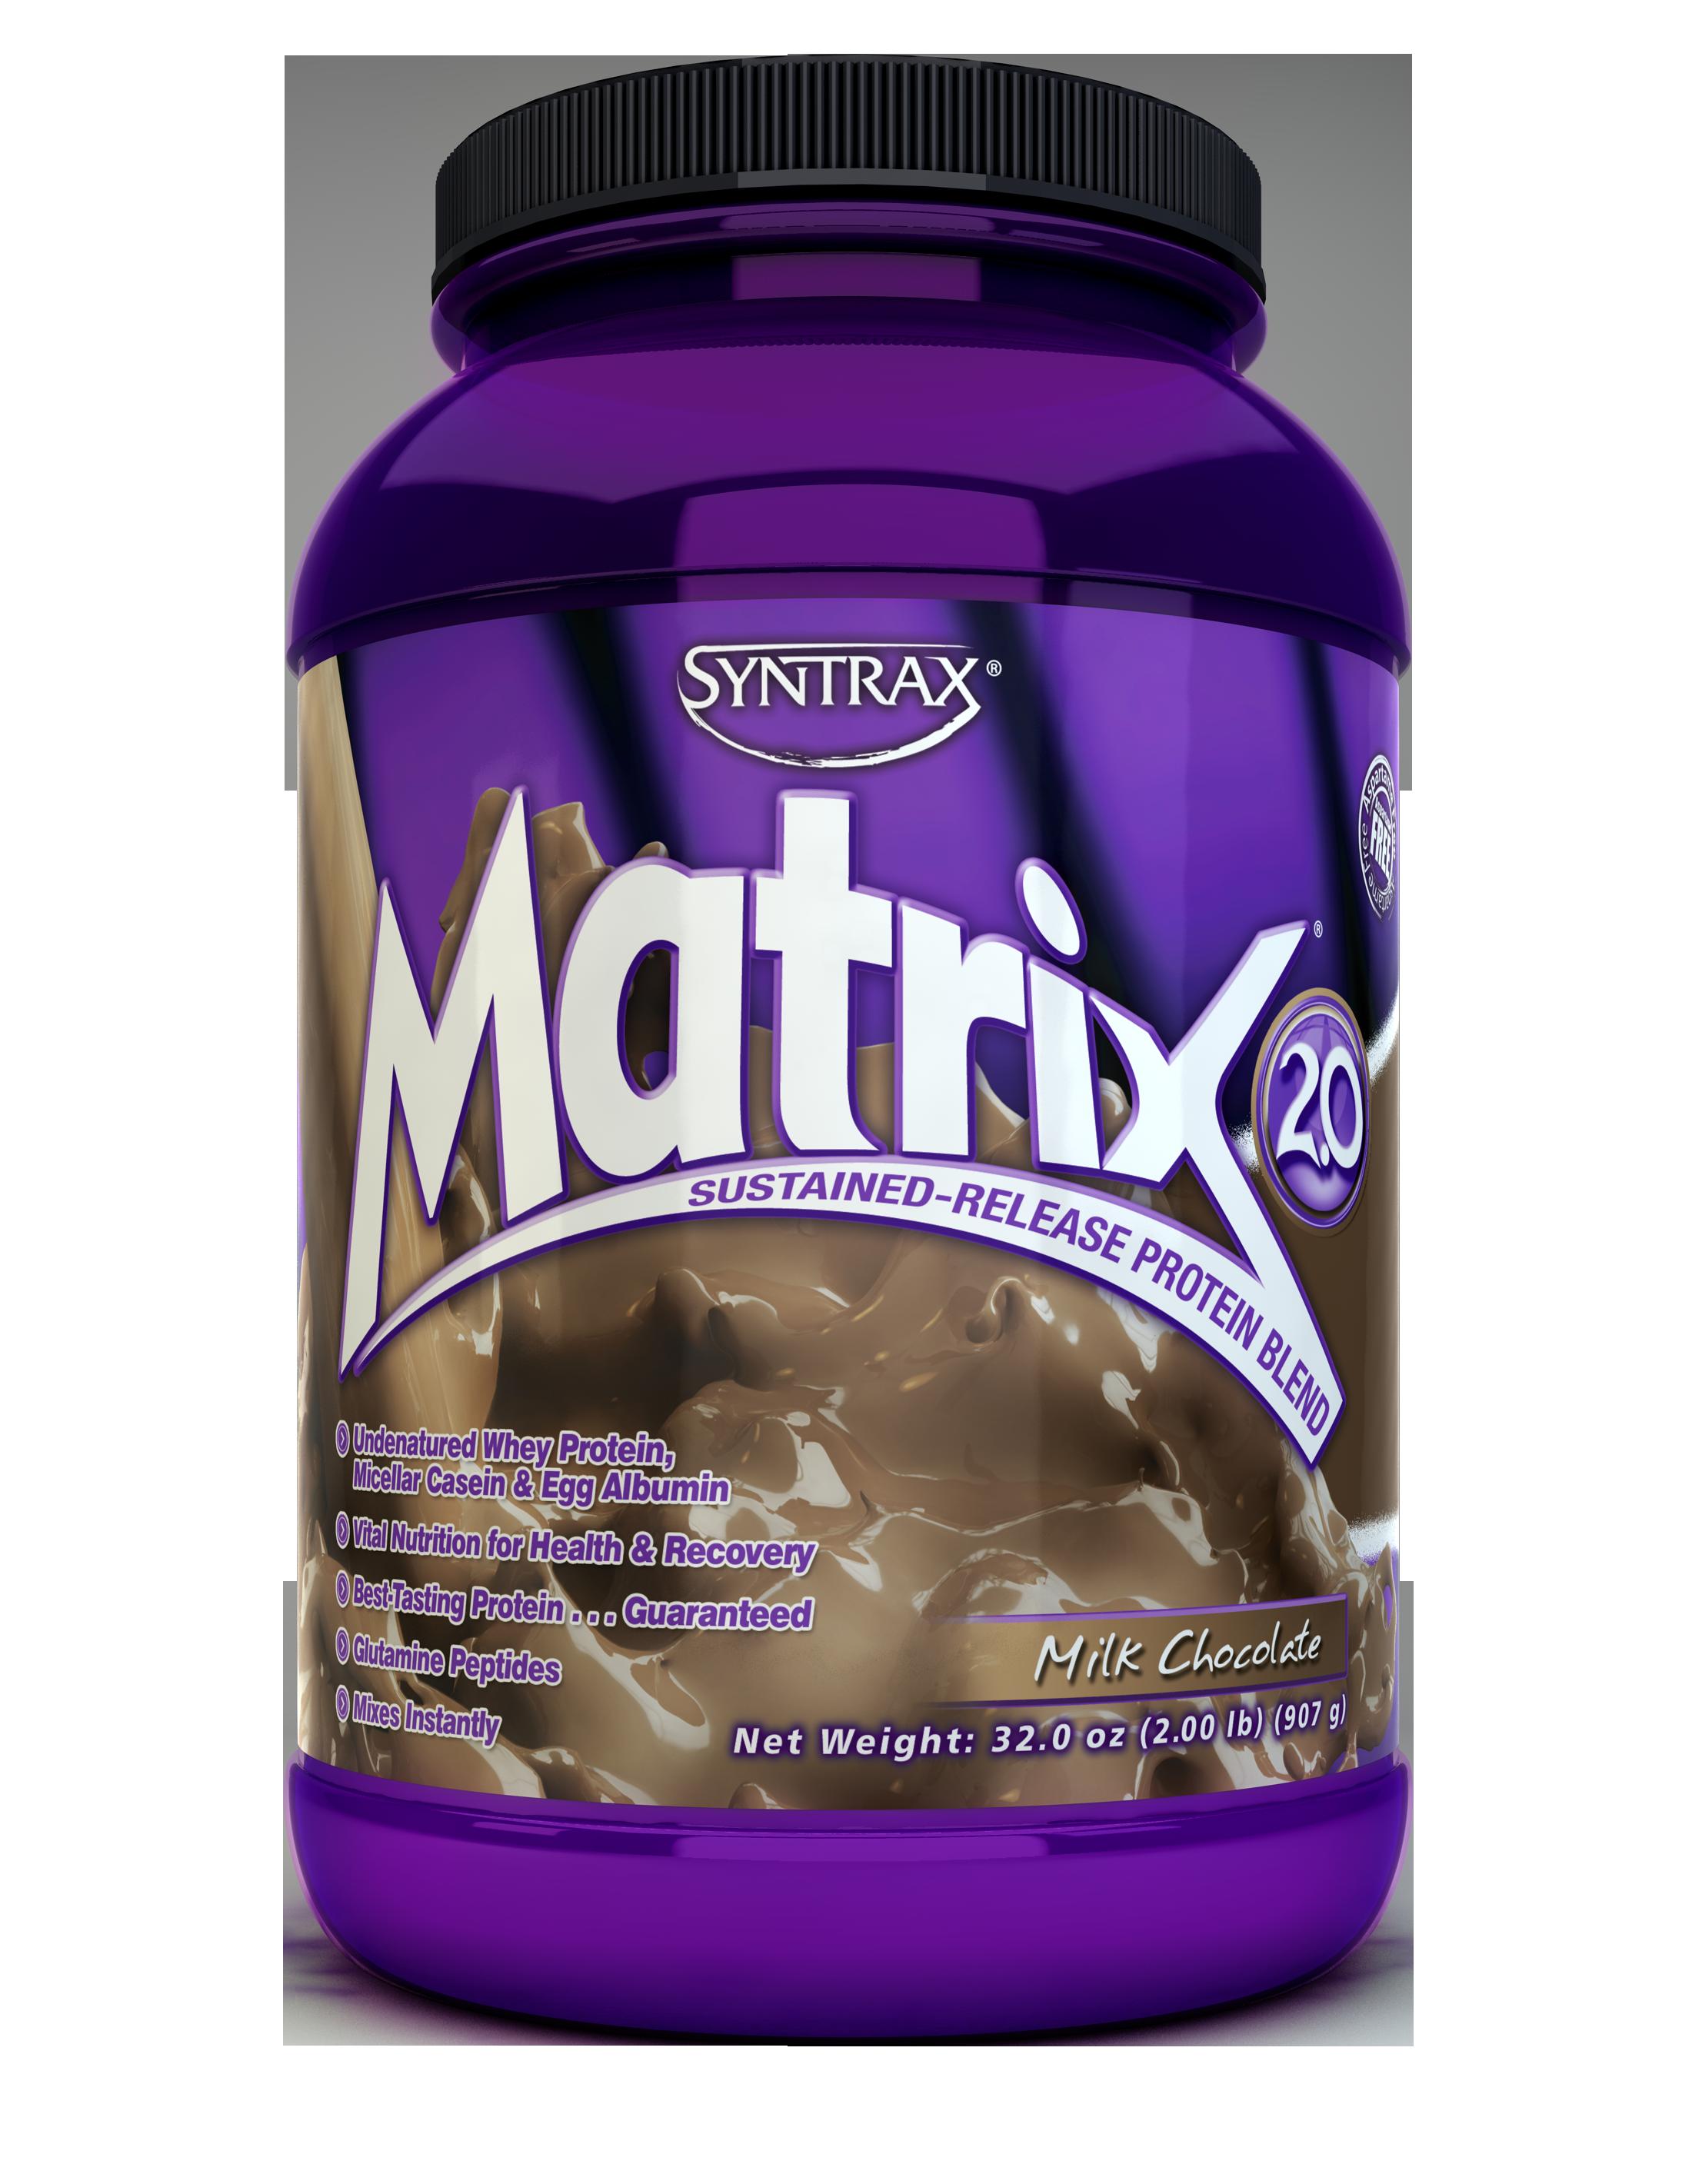 Syntrax Matrix 2.0 - Milk Chocolate 2 lb